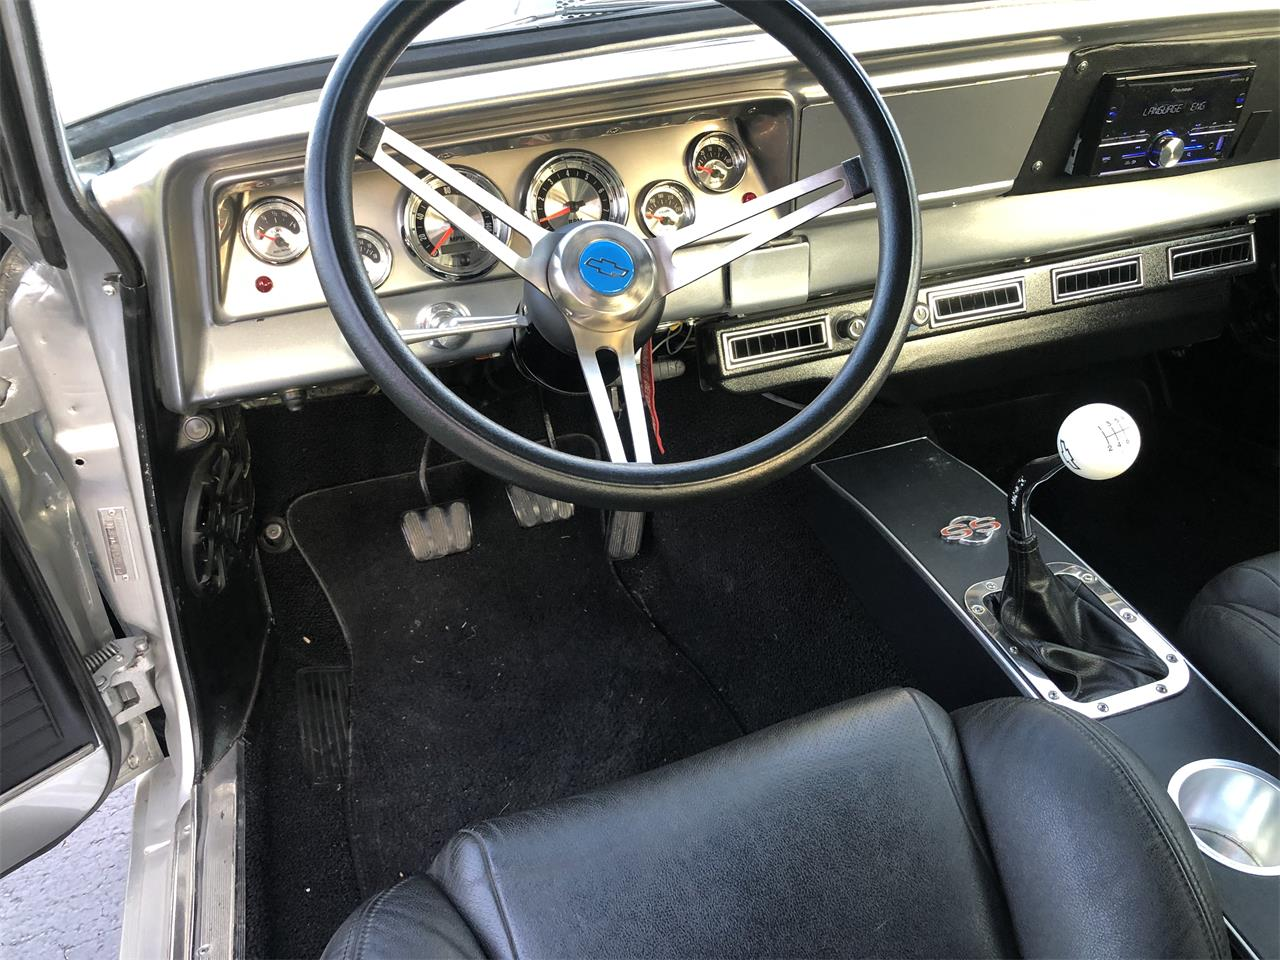 1966 Chevrolet Chevy II Nova SS (CC-1294645) for sale in Waterloo, Alabama